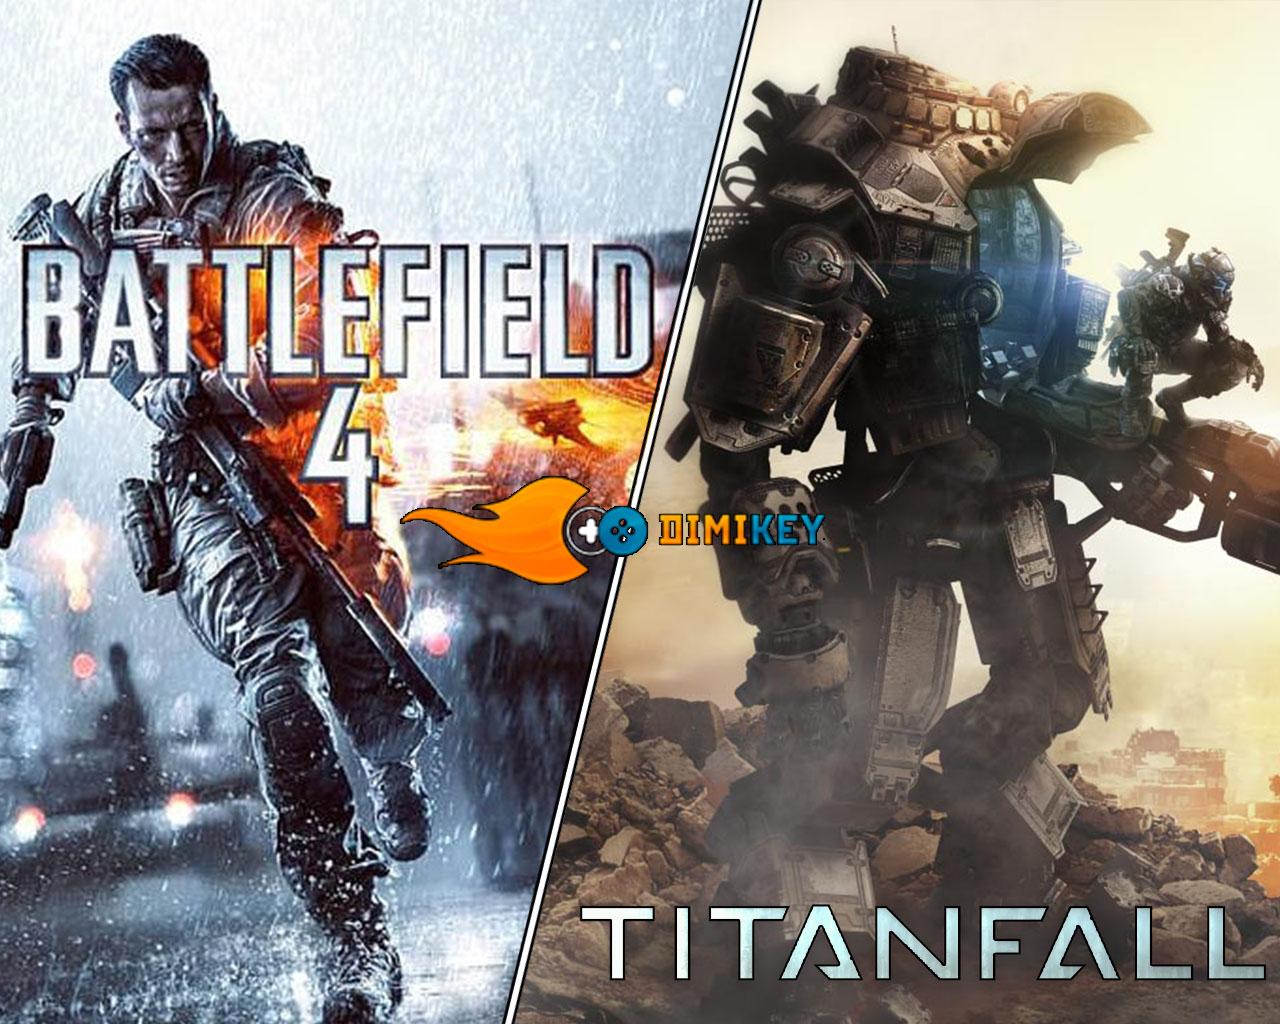 Titanfall + Battlefield 4 ответ на секр.вопрос [ORIGIN]